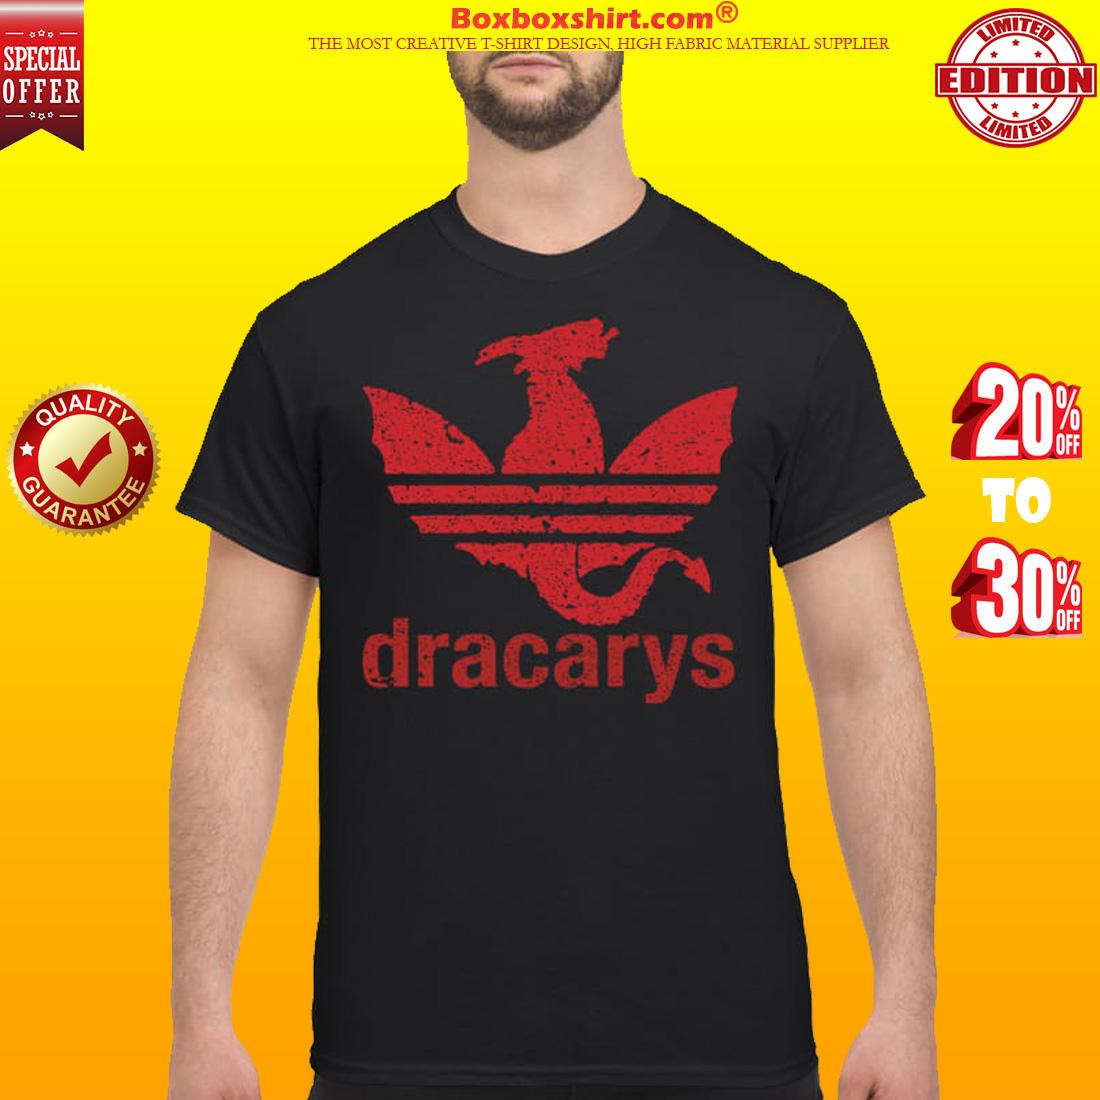 Dracarys adidas classic shirt